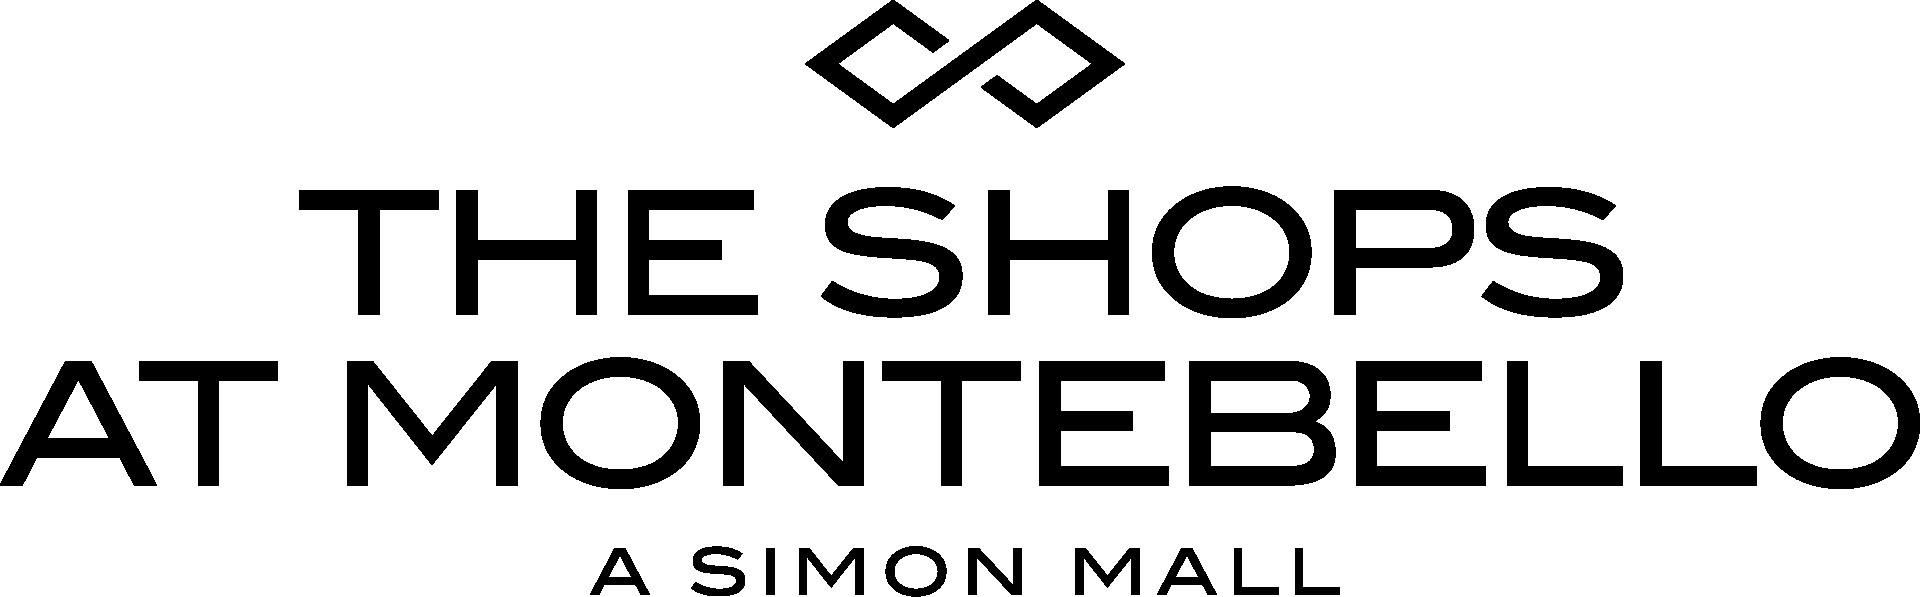 TheShopsAtMontebello-2014.jpg